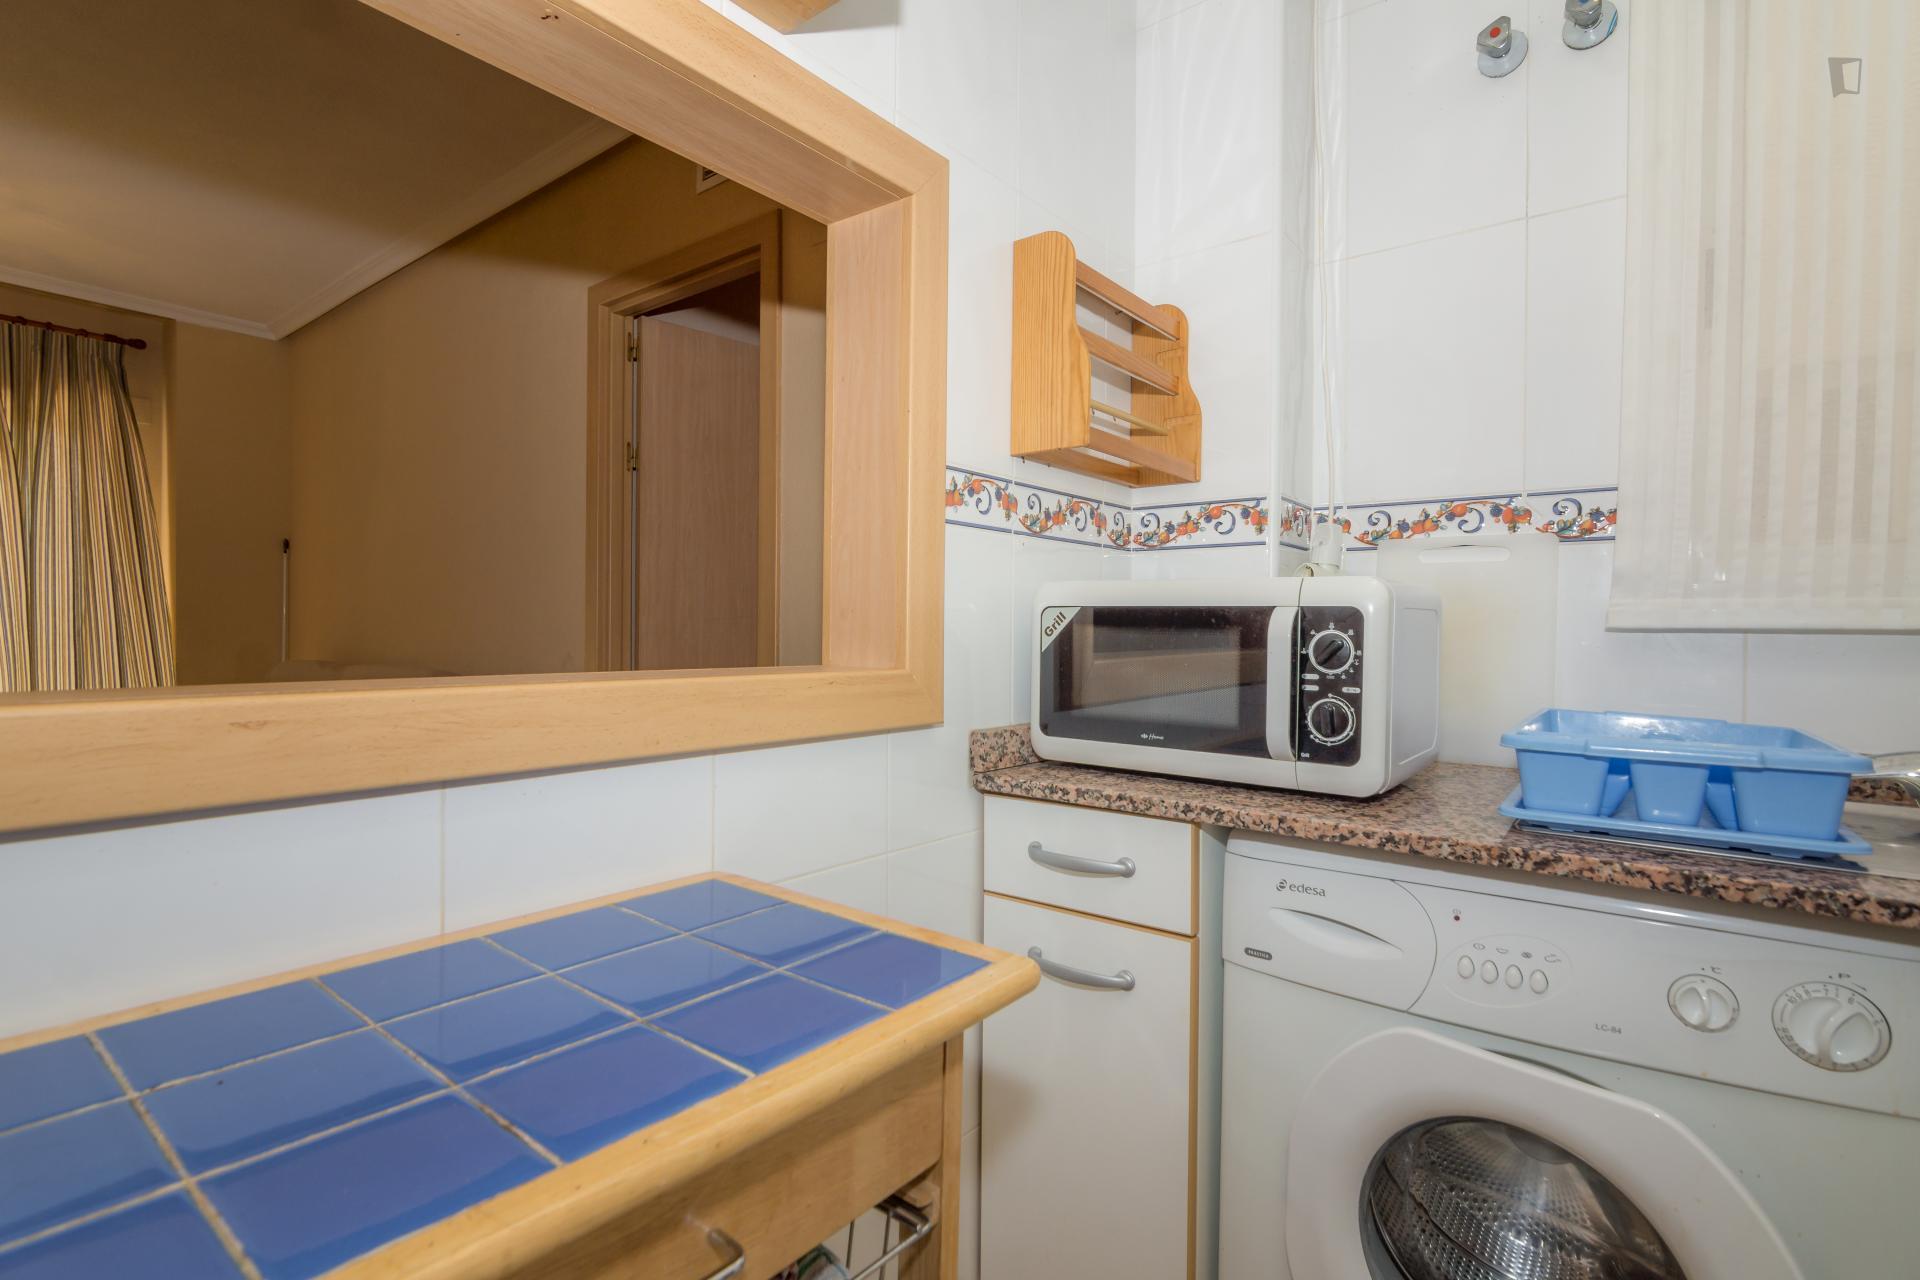 Sant Joan - 2 bedroom apartment in Alicante